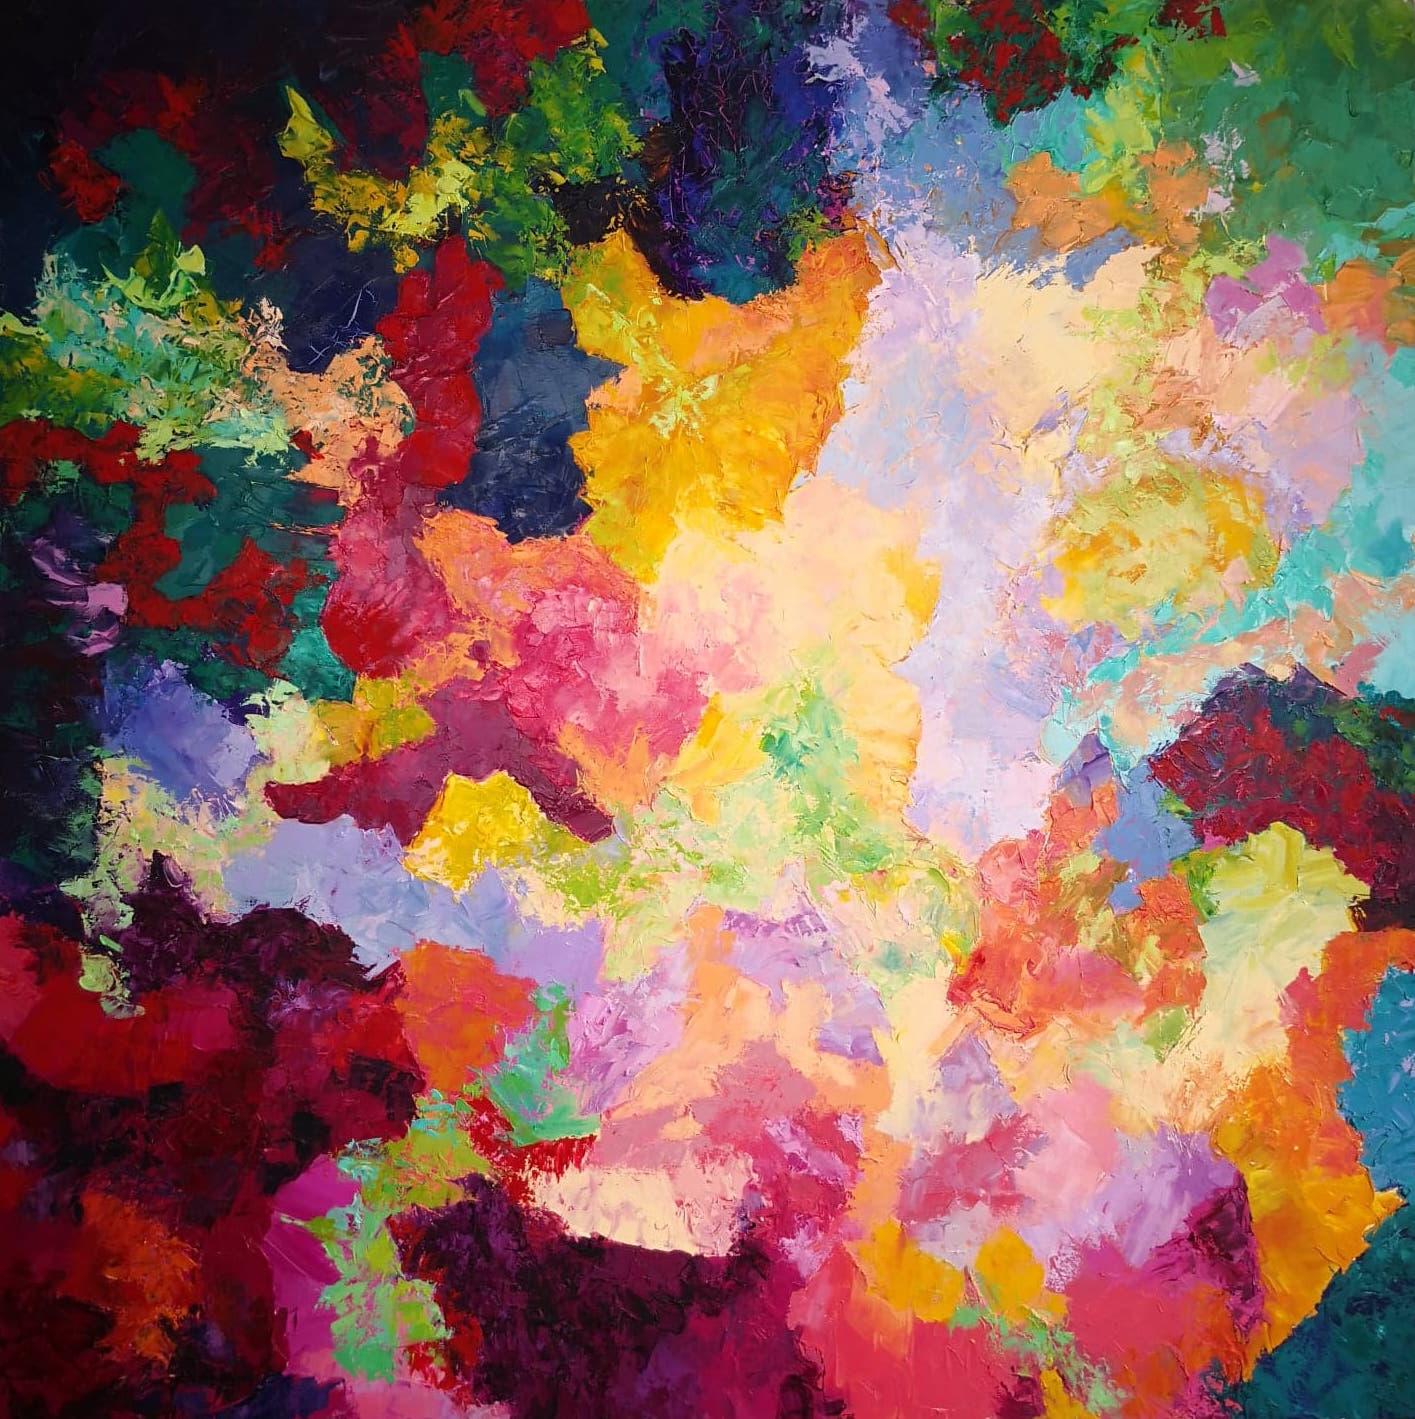 Heather M. Johnson, Cusp, Oil on canvas, 36 x 36 inches, $500.jpg